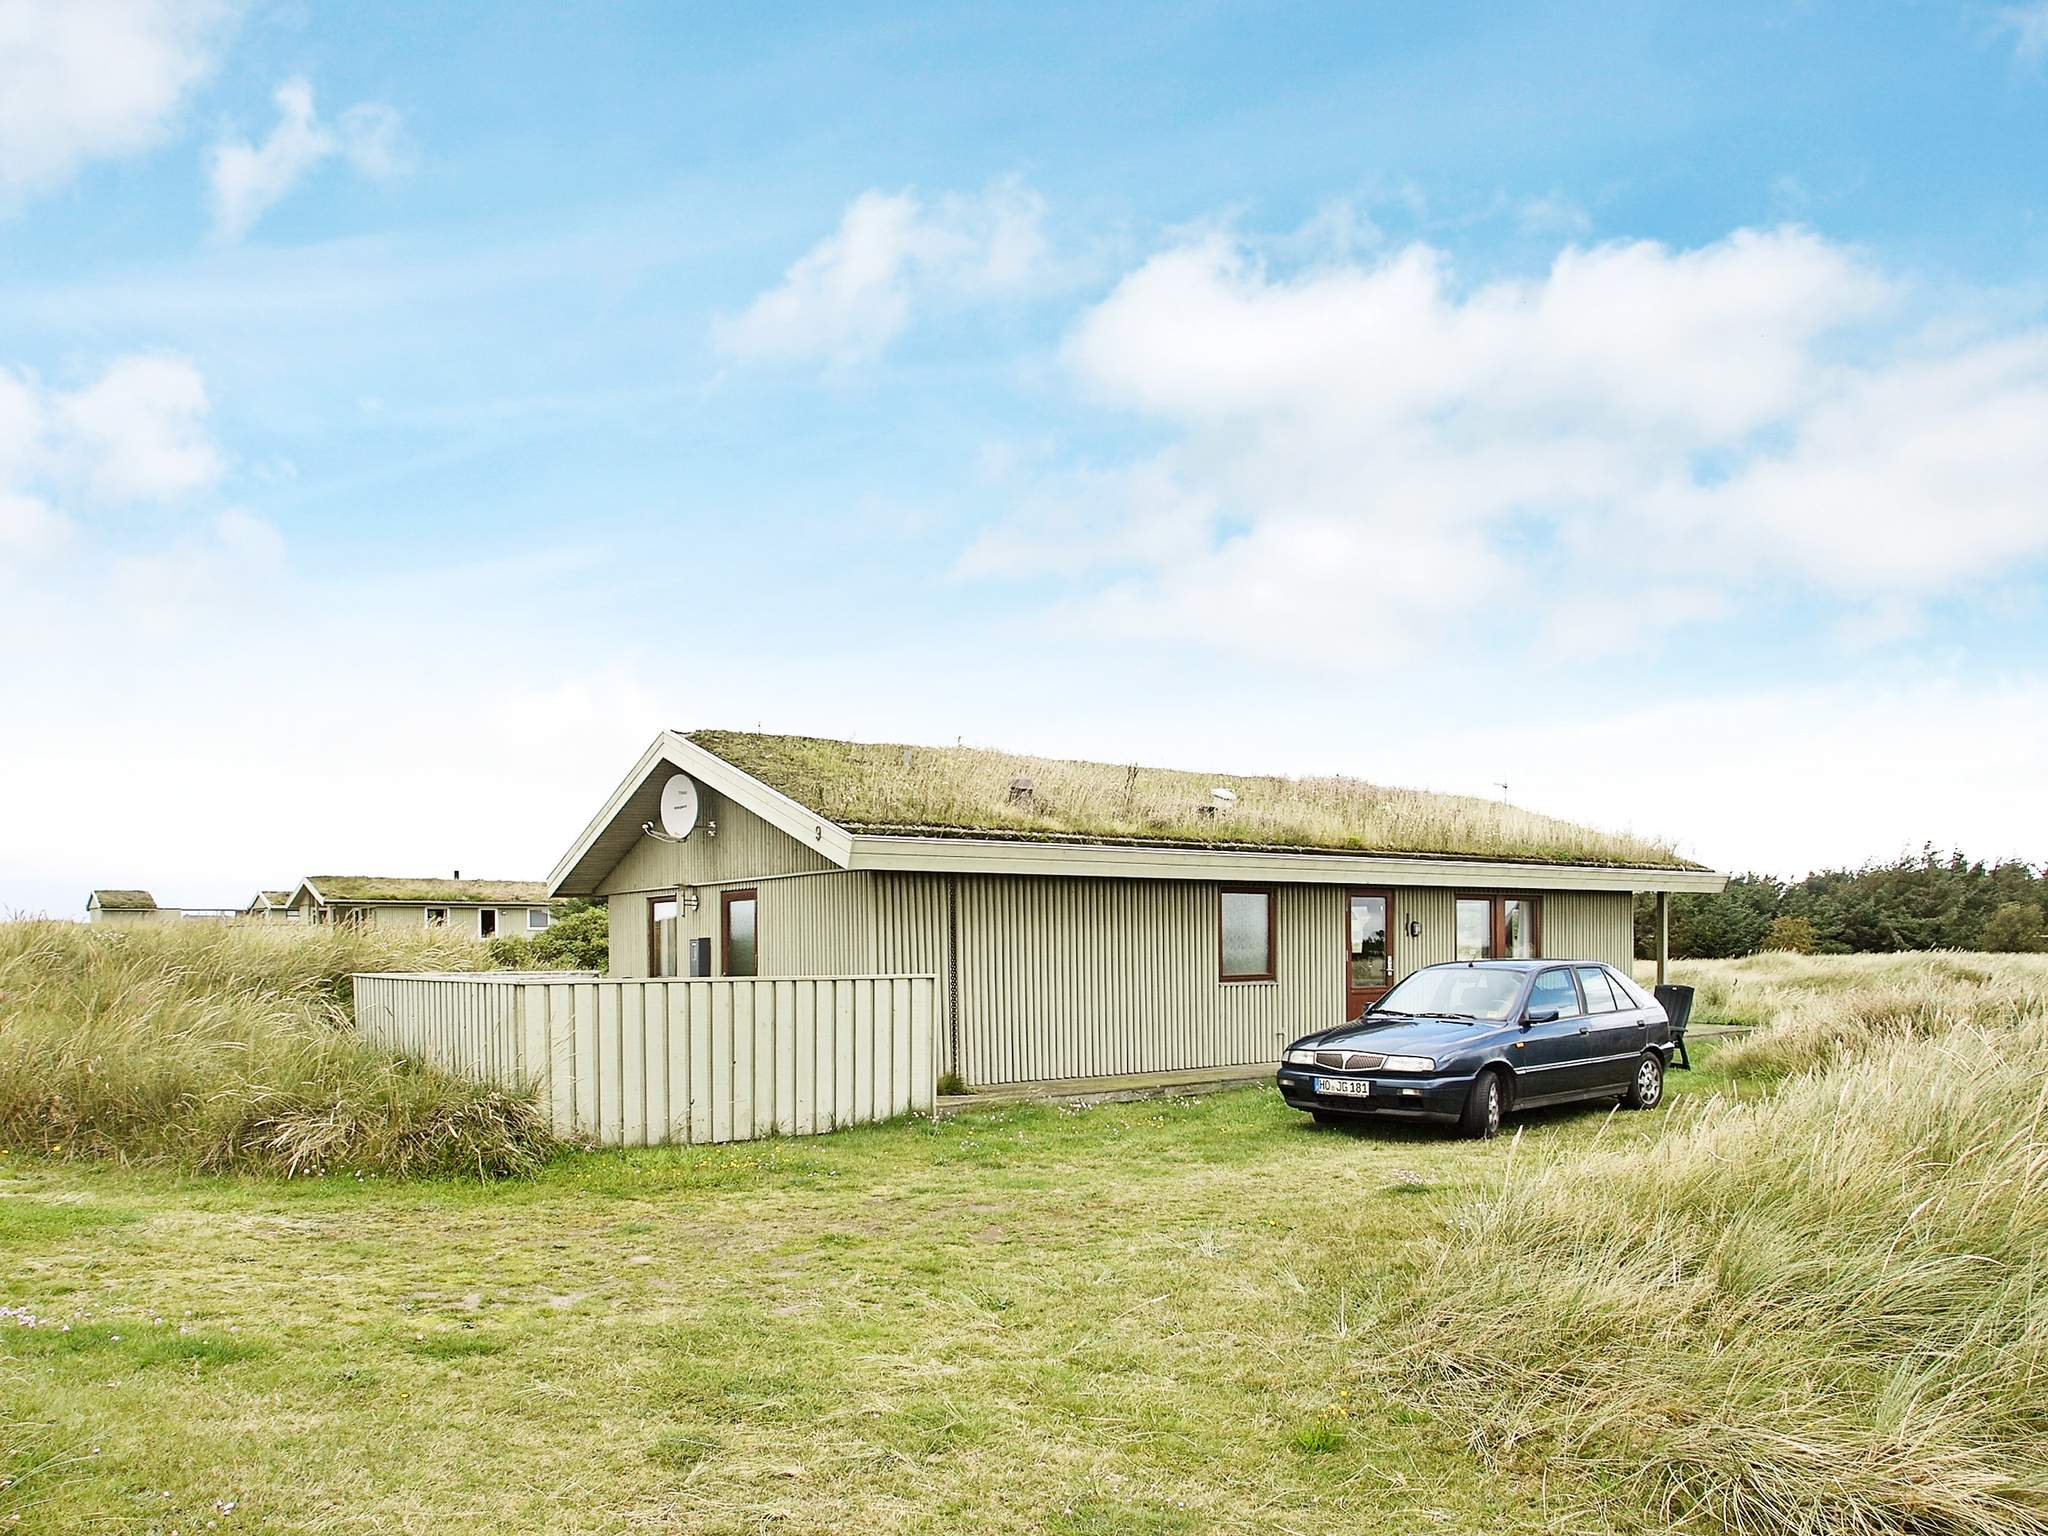 Ferienhaus Grønhøj Strand (83808), Løkken, , Nordwestjütland, Dänemark, Bild 19